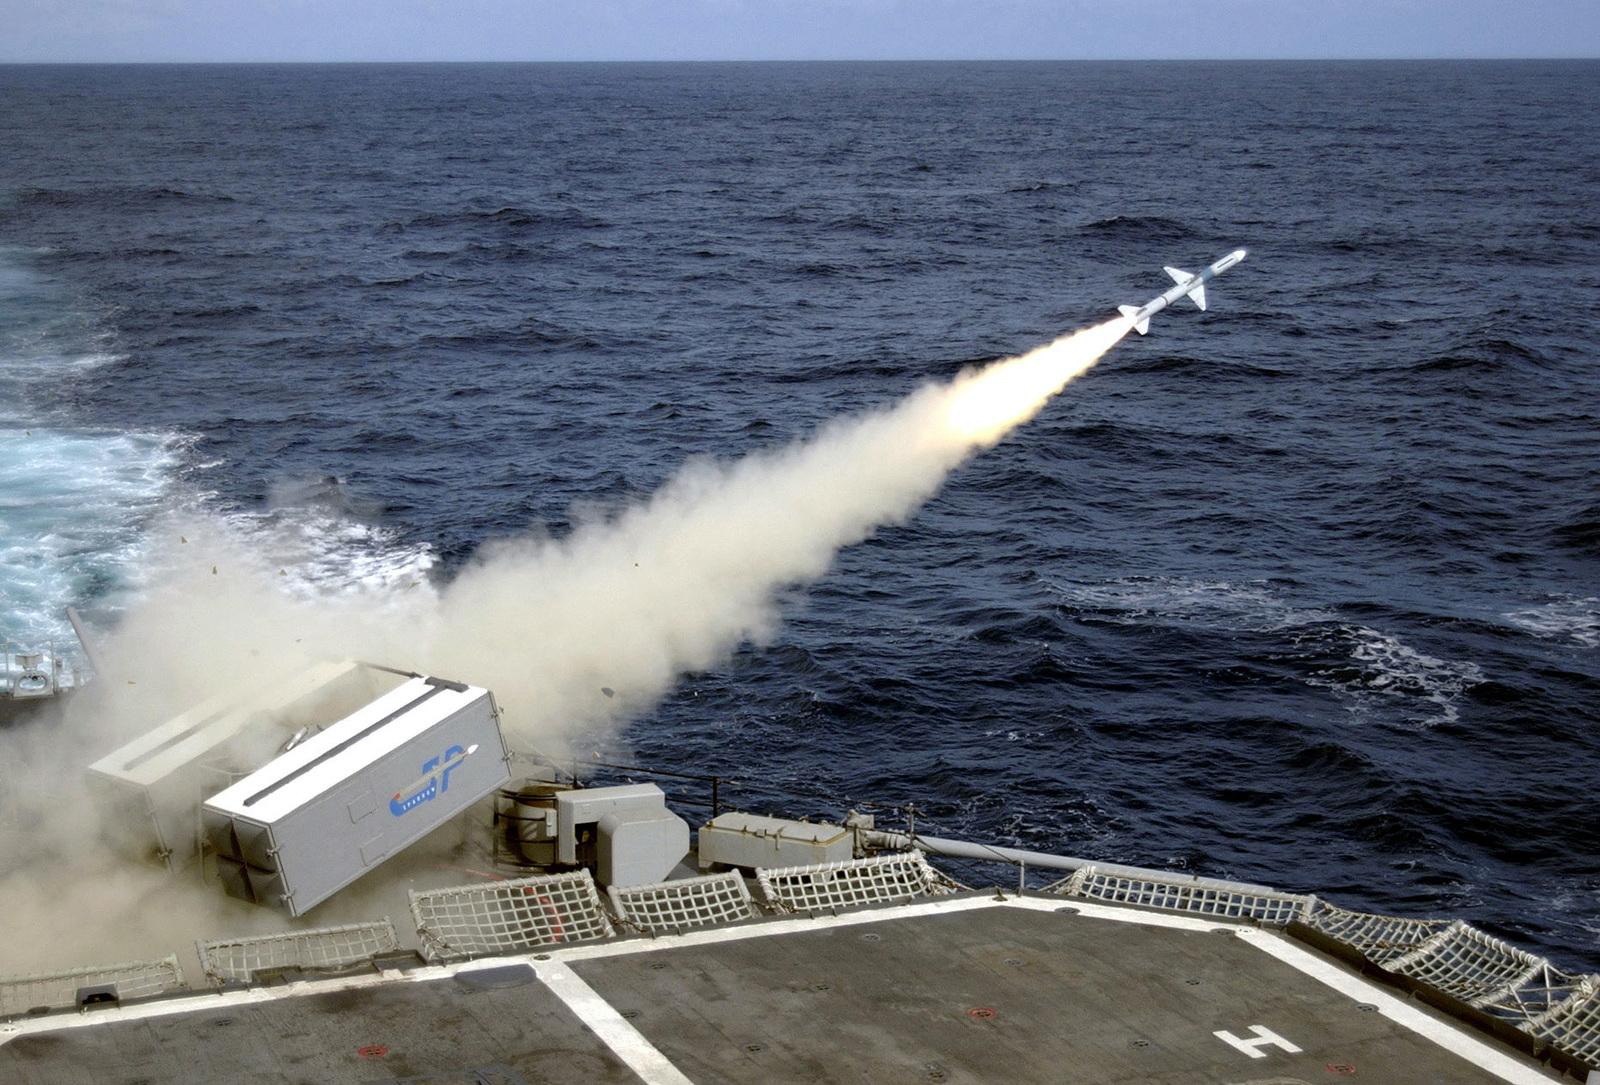 defeating cruise missiles air power australia - HD1600×1085